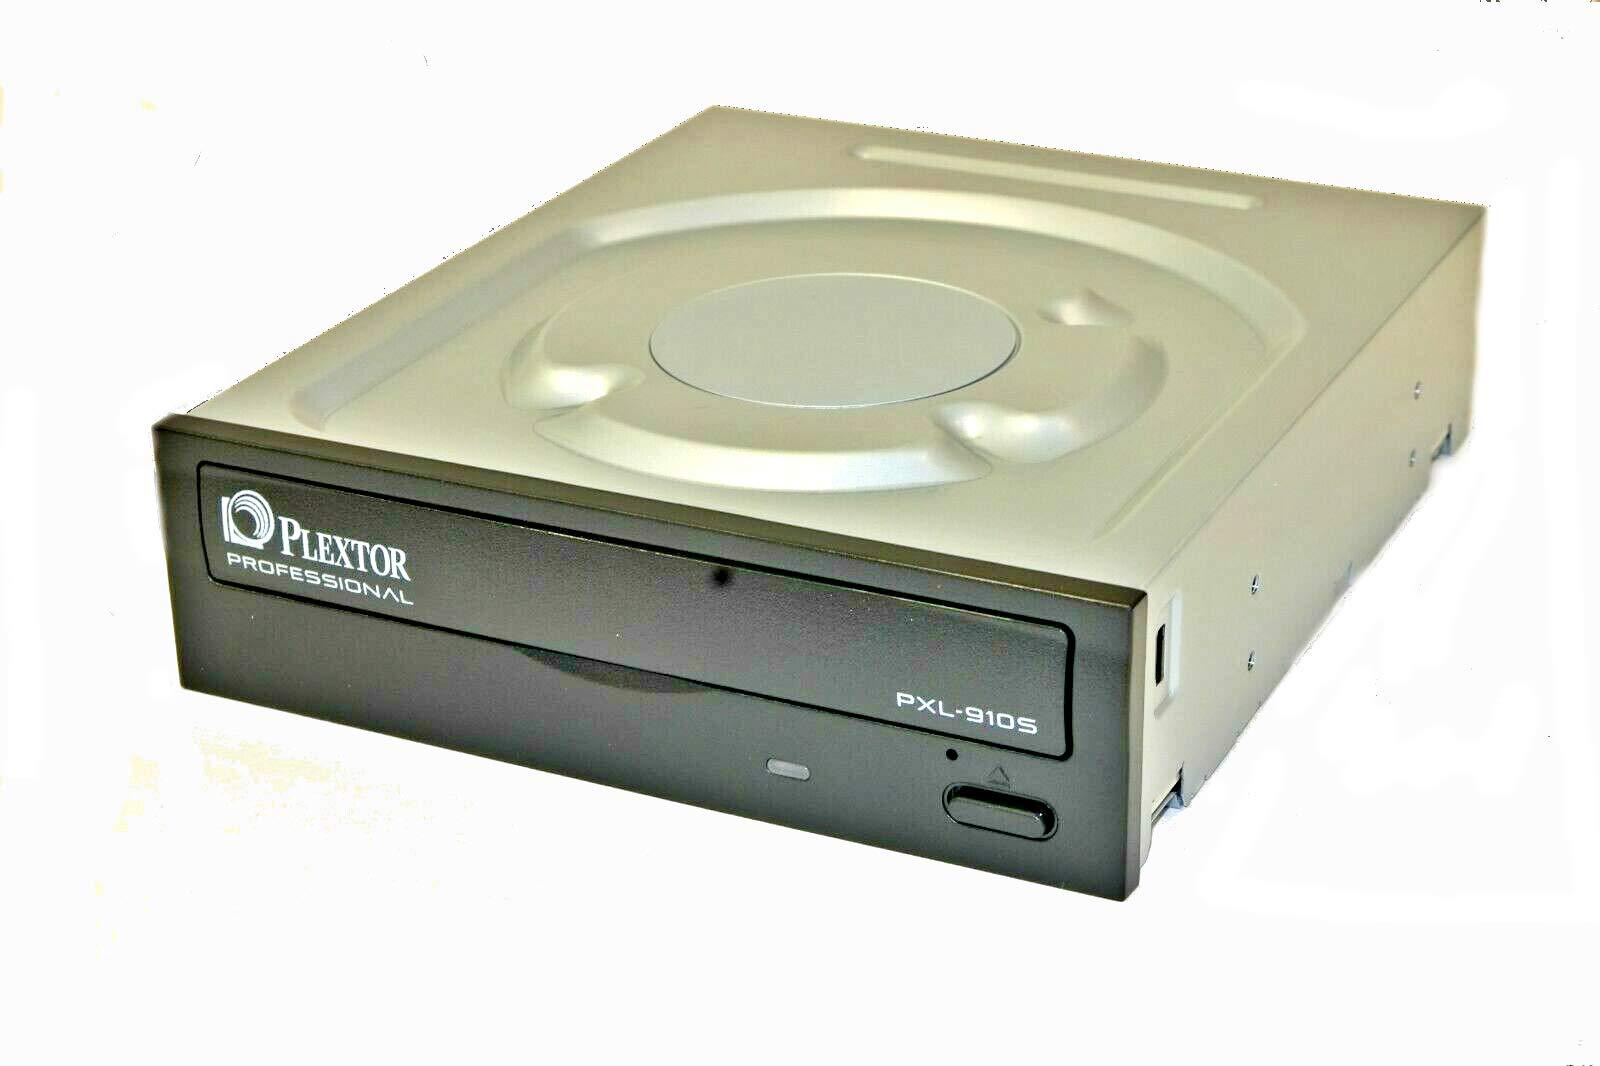 Plextor PXL-910S Professional Internal SATA Serial ATA DVD/CD Writer Drive for Desktop PC Computer - Bulk Pack (PXL-910S) - Acumen Disc Edition